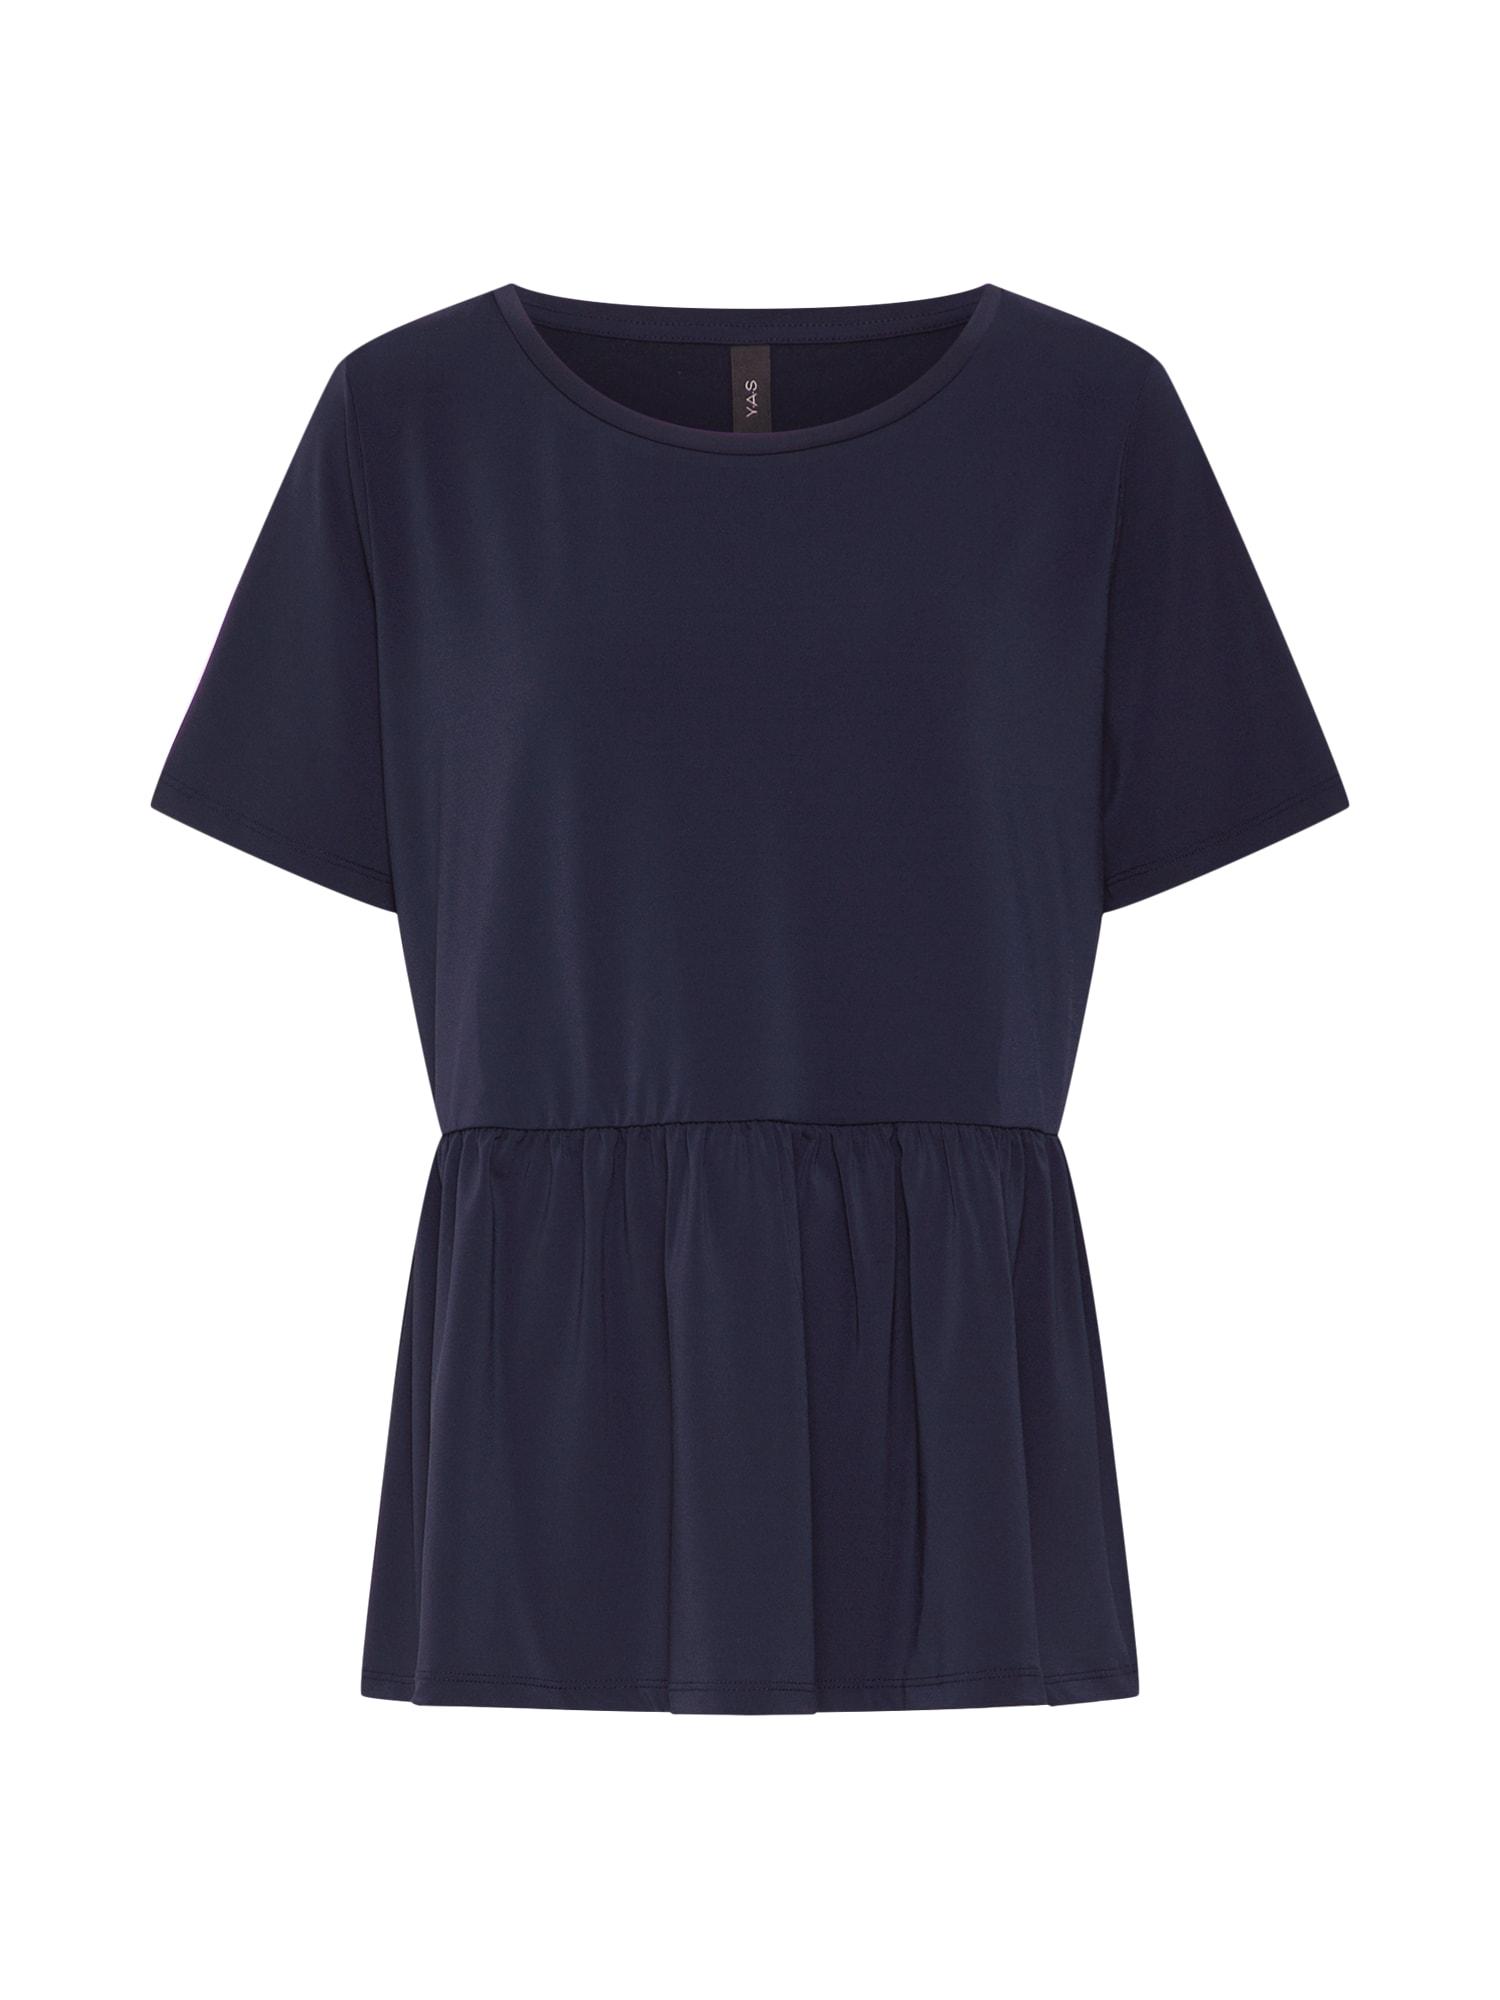 Tričko LIRA tmavě modrá Y.A.S